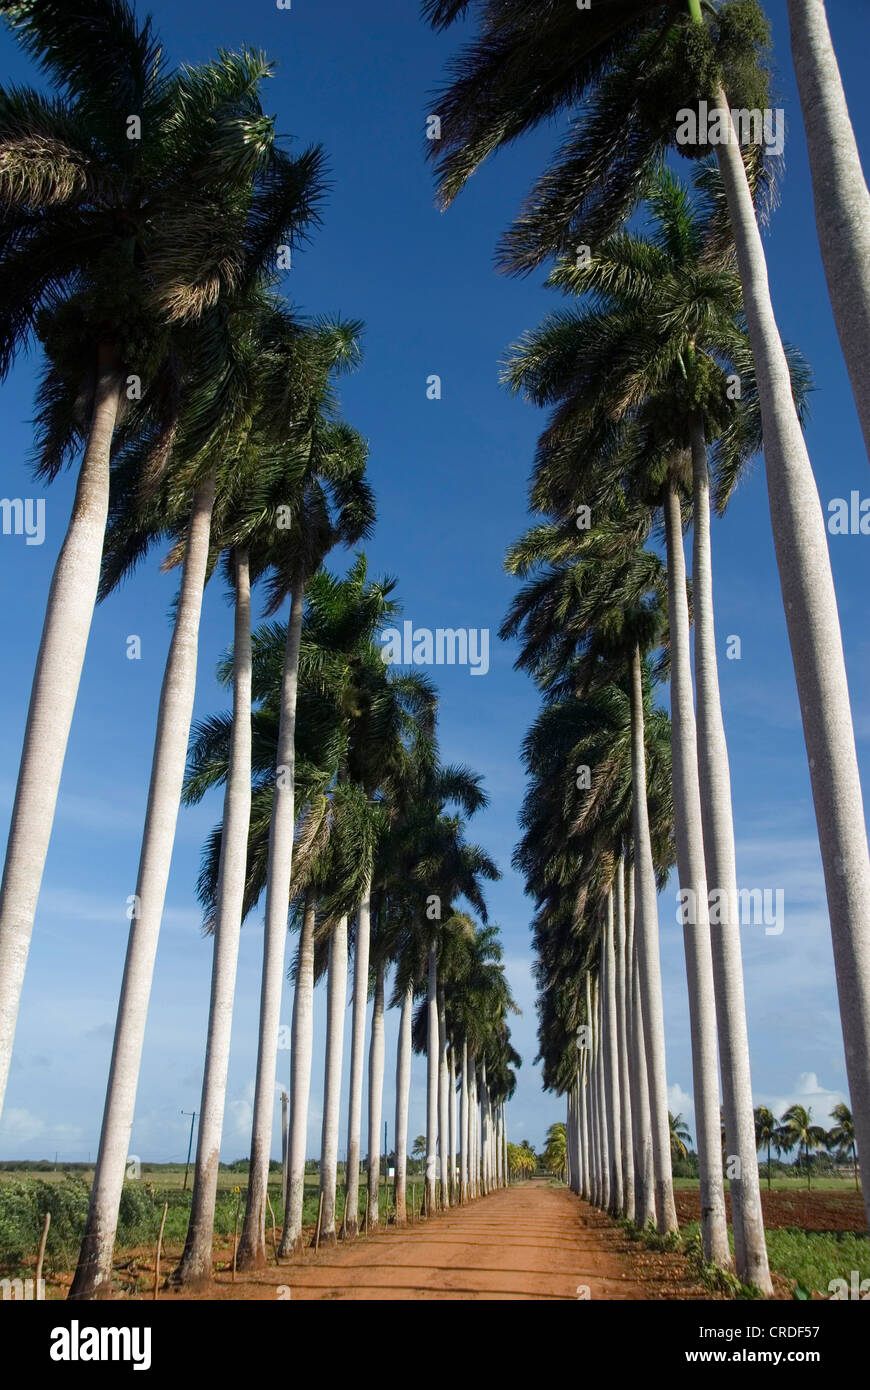 Royal palm (Roystonea regia), palm tree avenue near ...